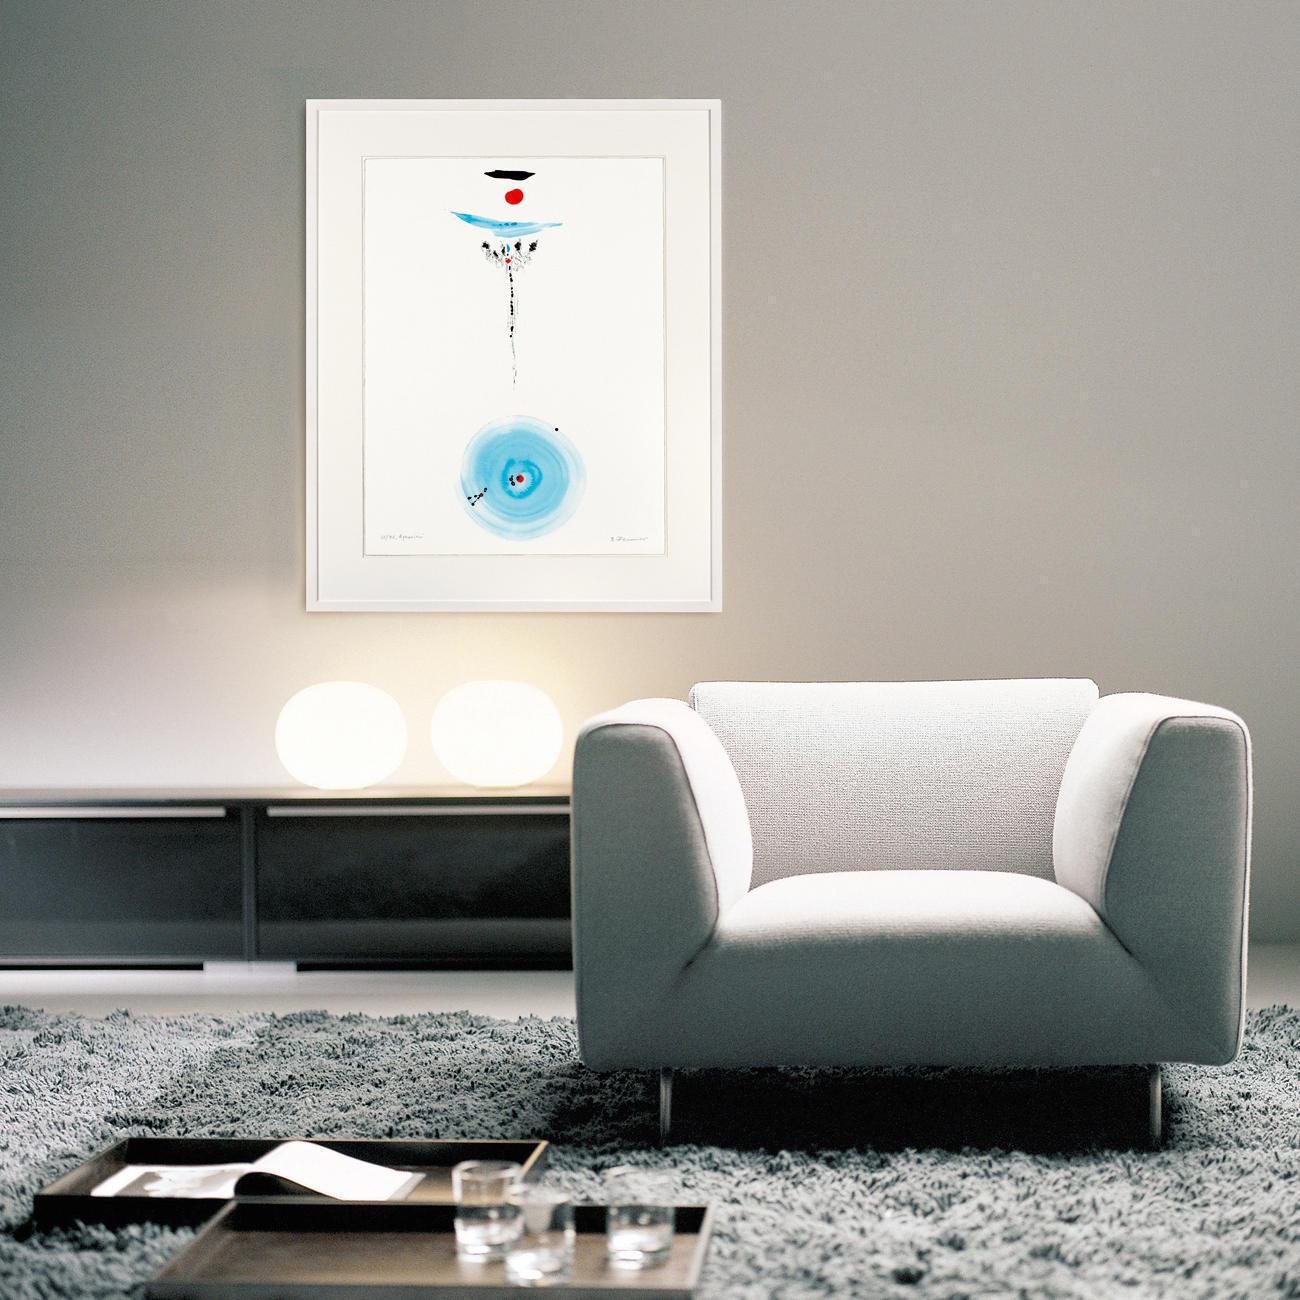 brigitta zeumer aquarius kaufen pro idee kunstformat. Black Bedroom Furniture Sets. Home Design Ideas